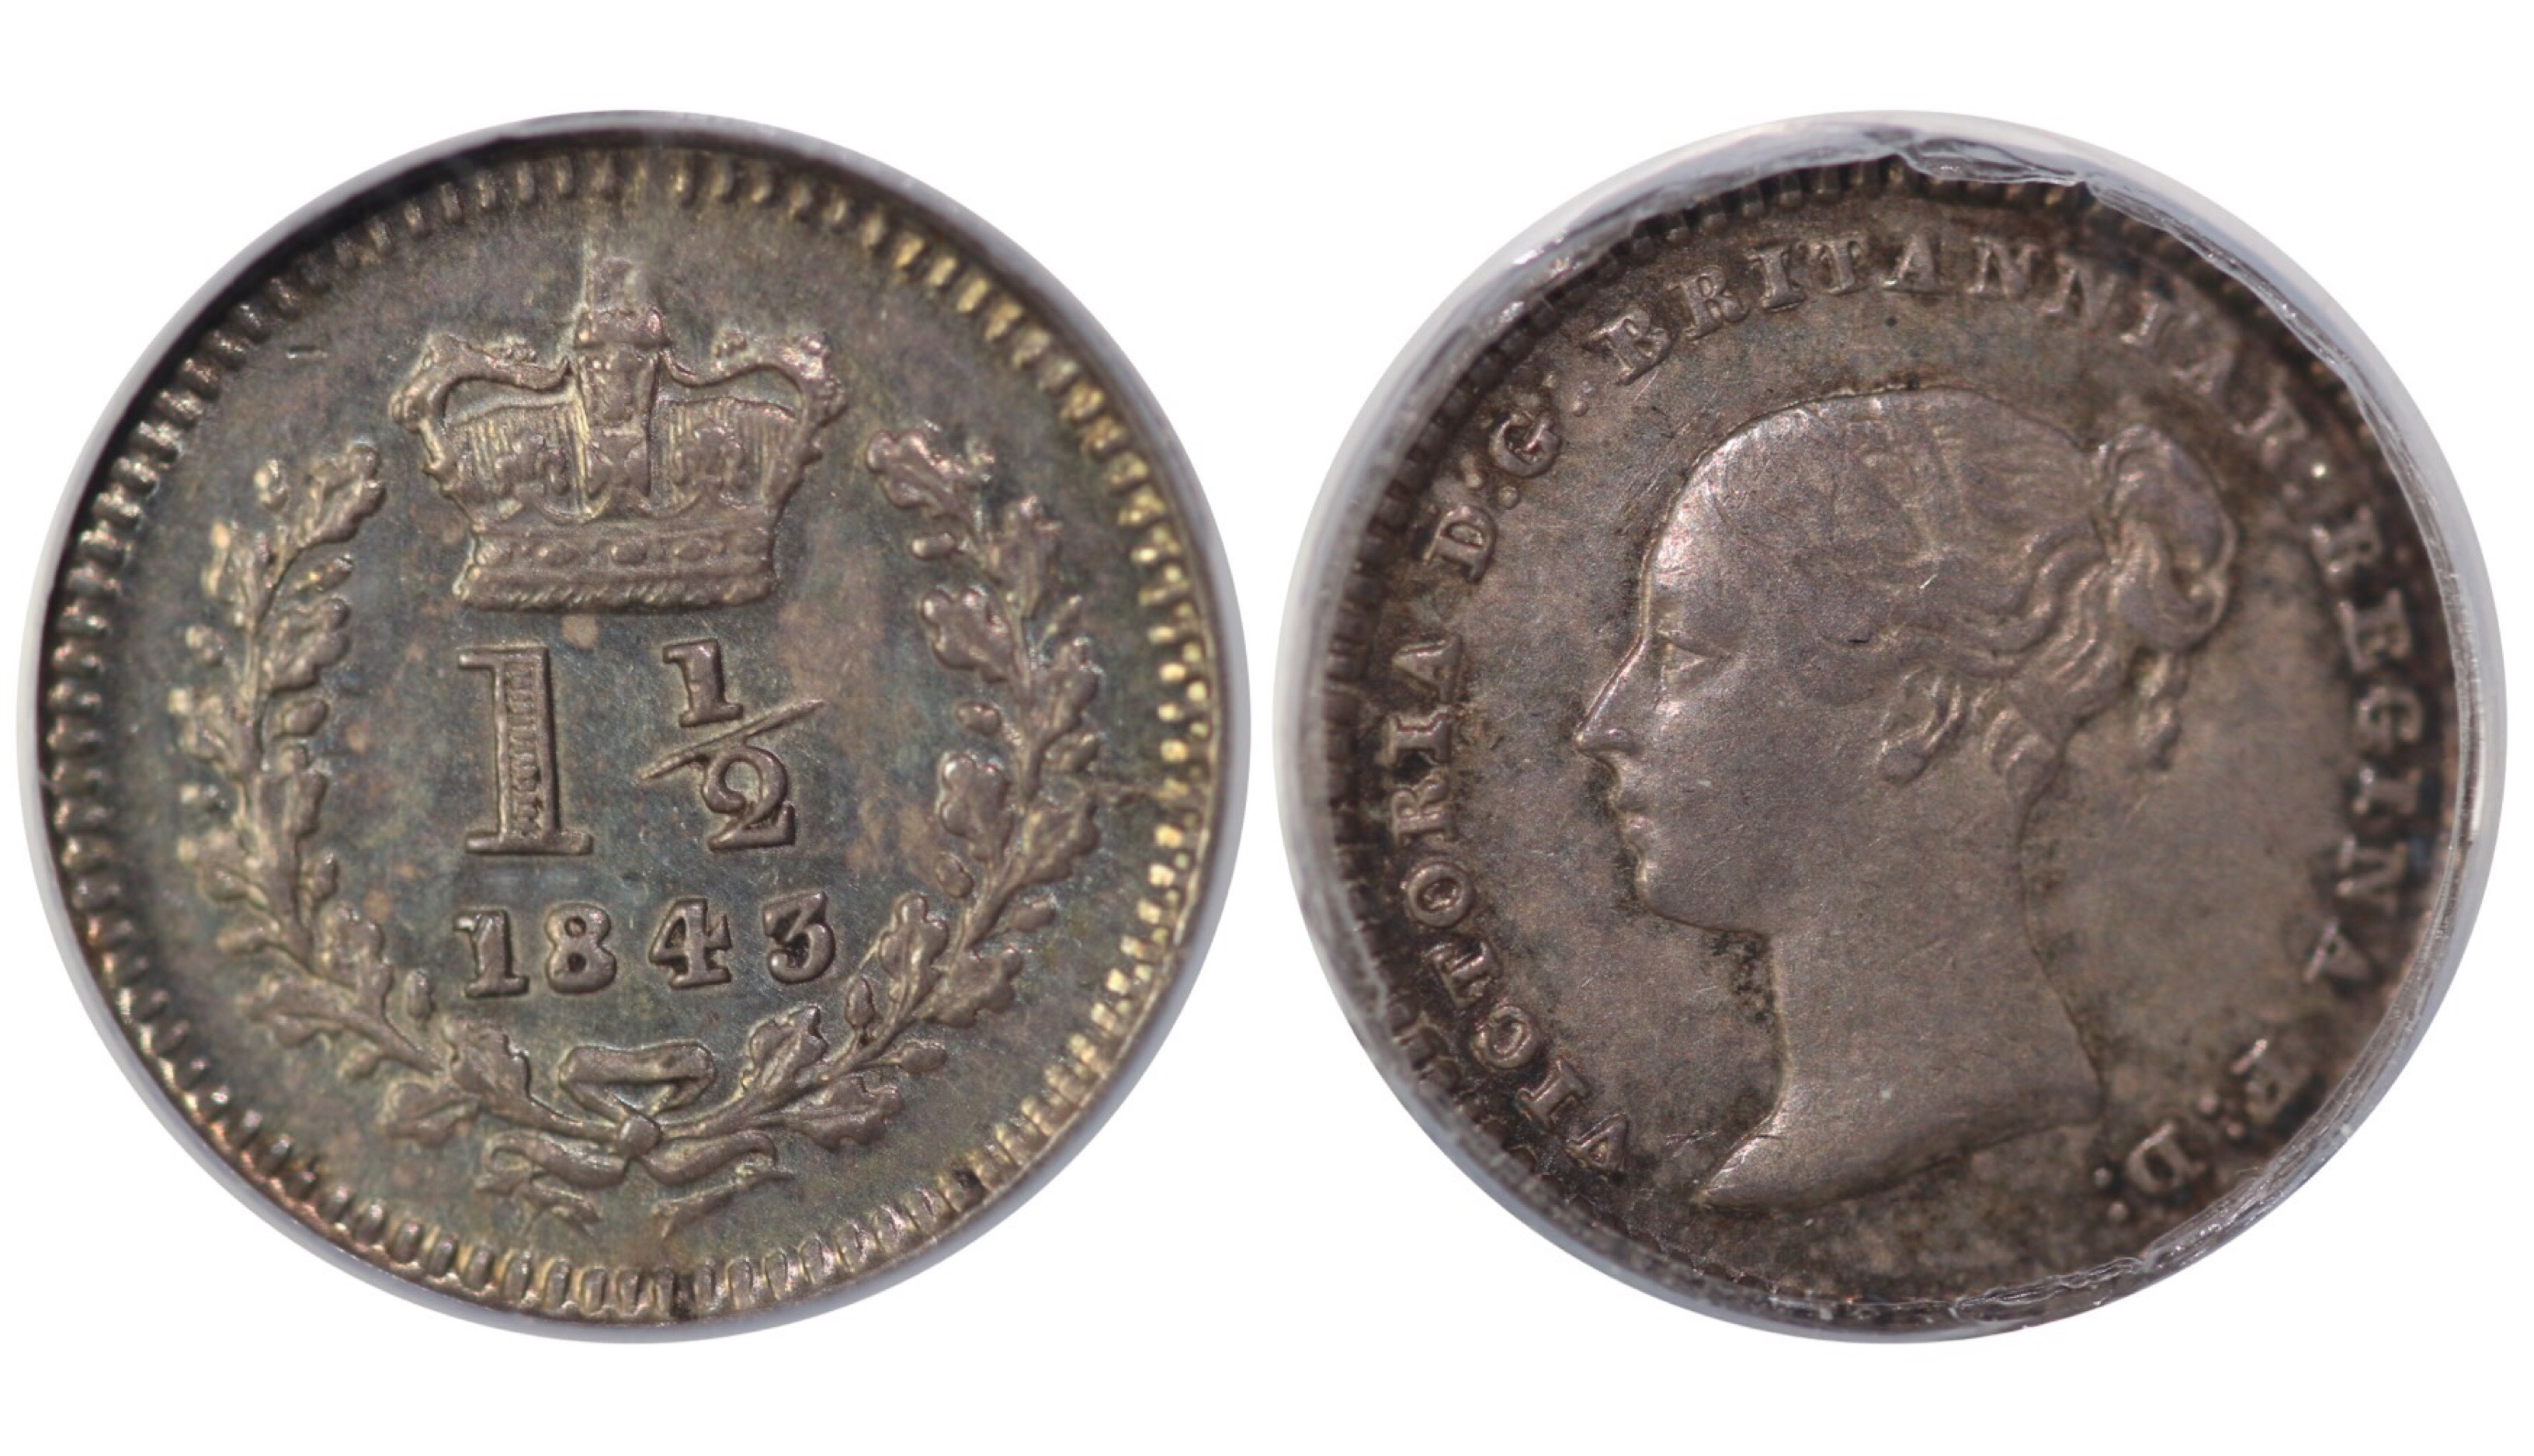 1843 Threehalfpence, Flat top 4, CGS 65, Victoria, CGS variety 5,, UIN 17482